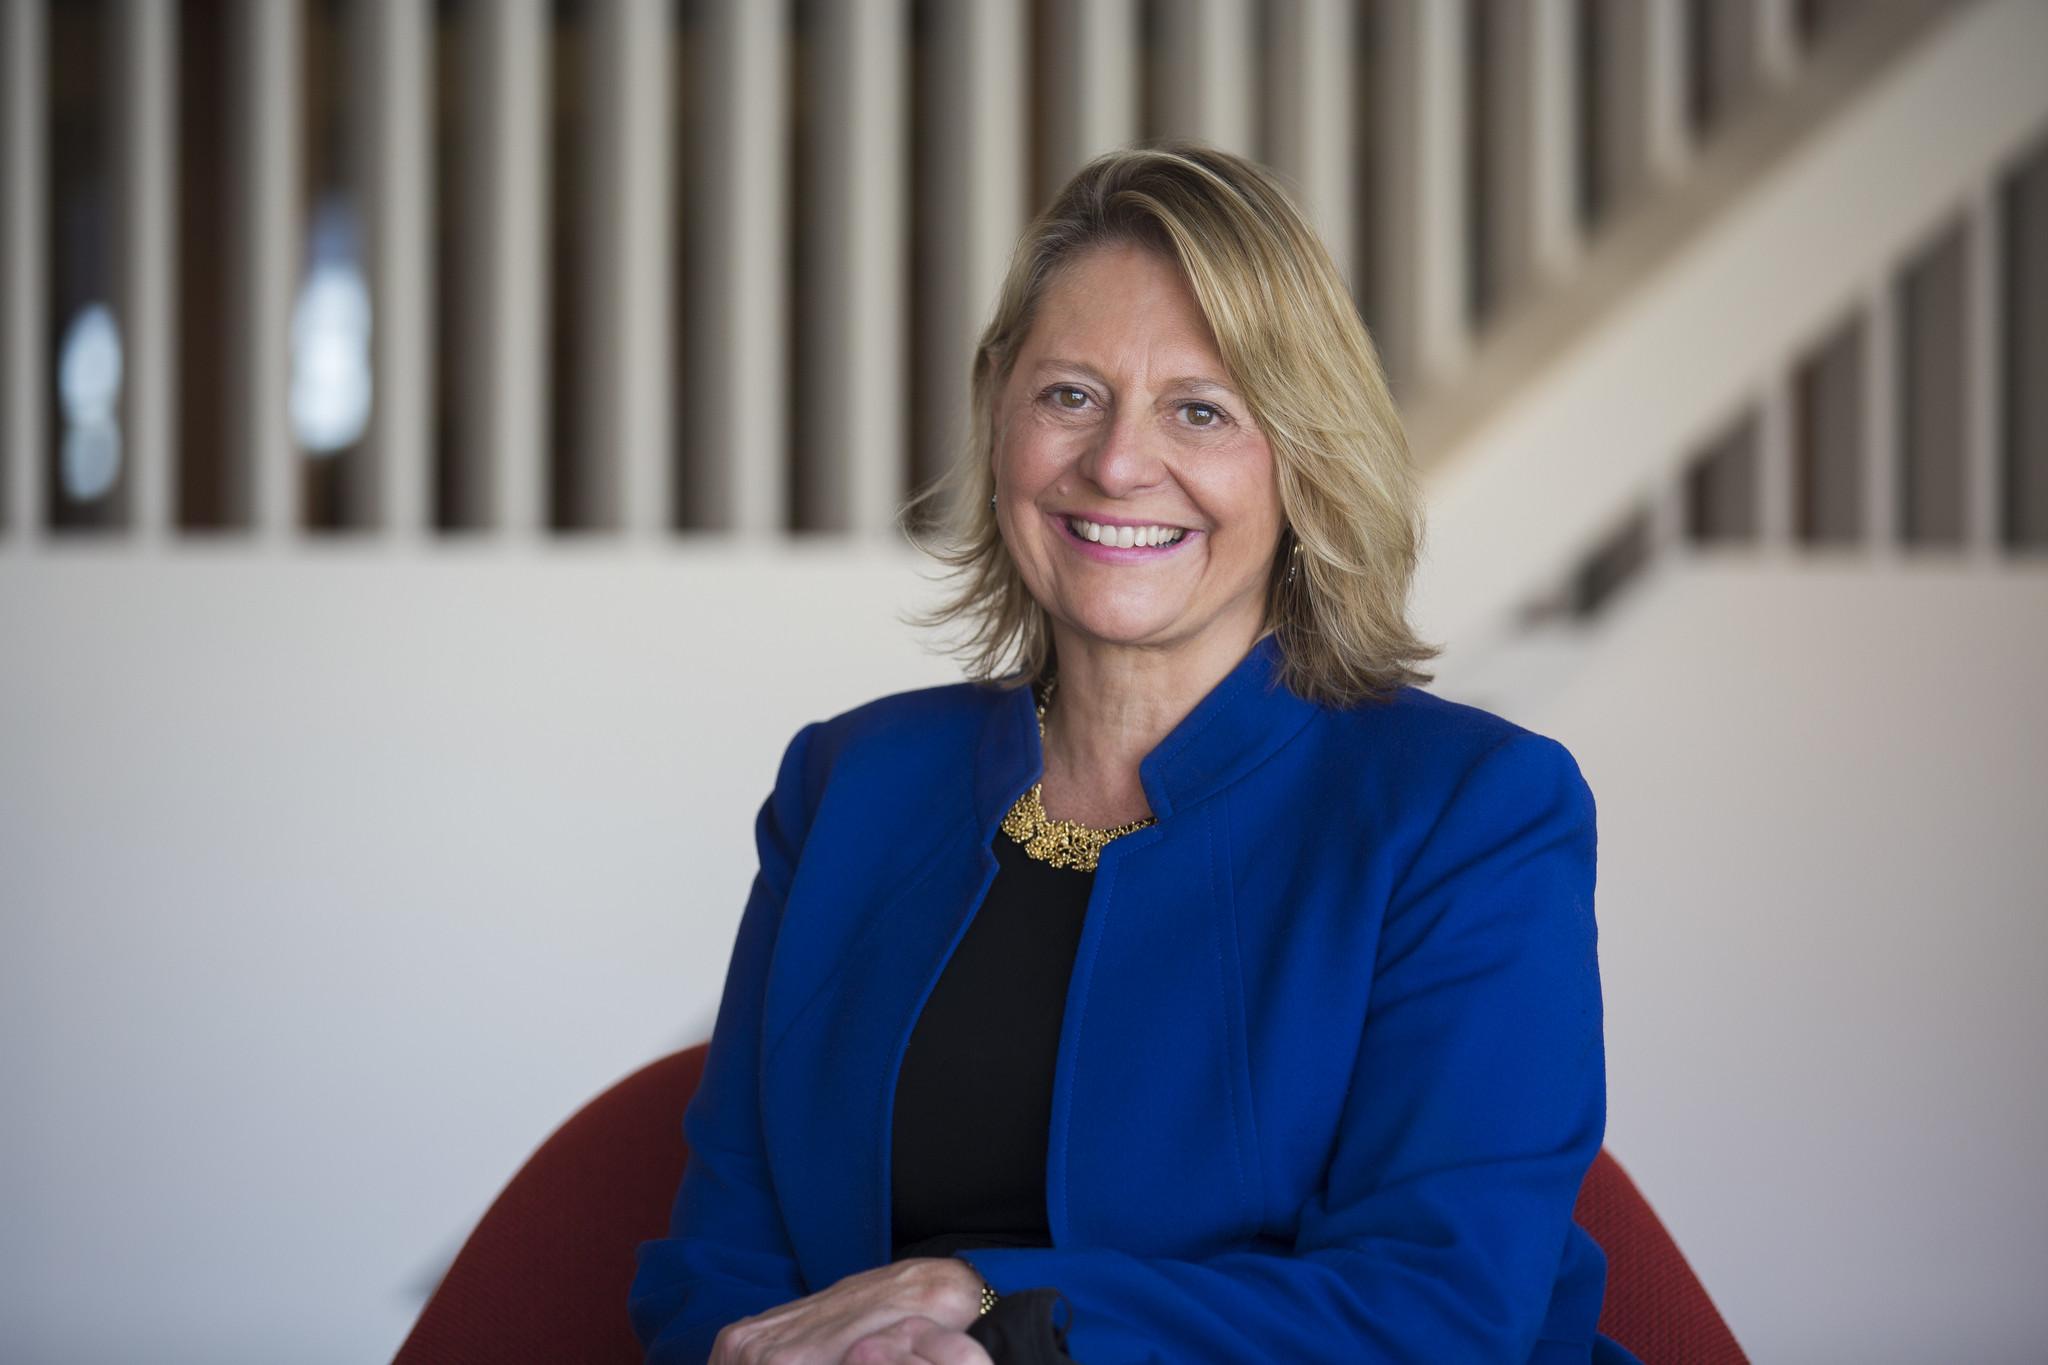 Bennington College President Laura Walker